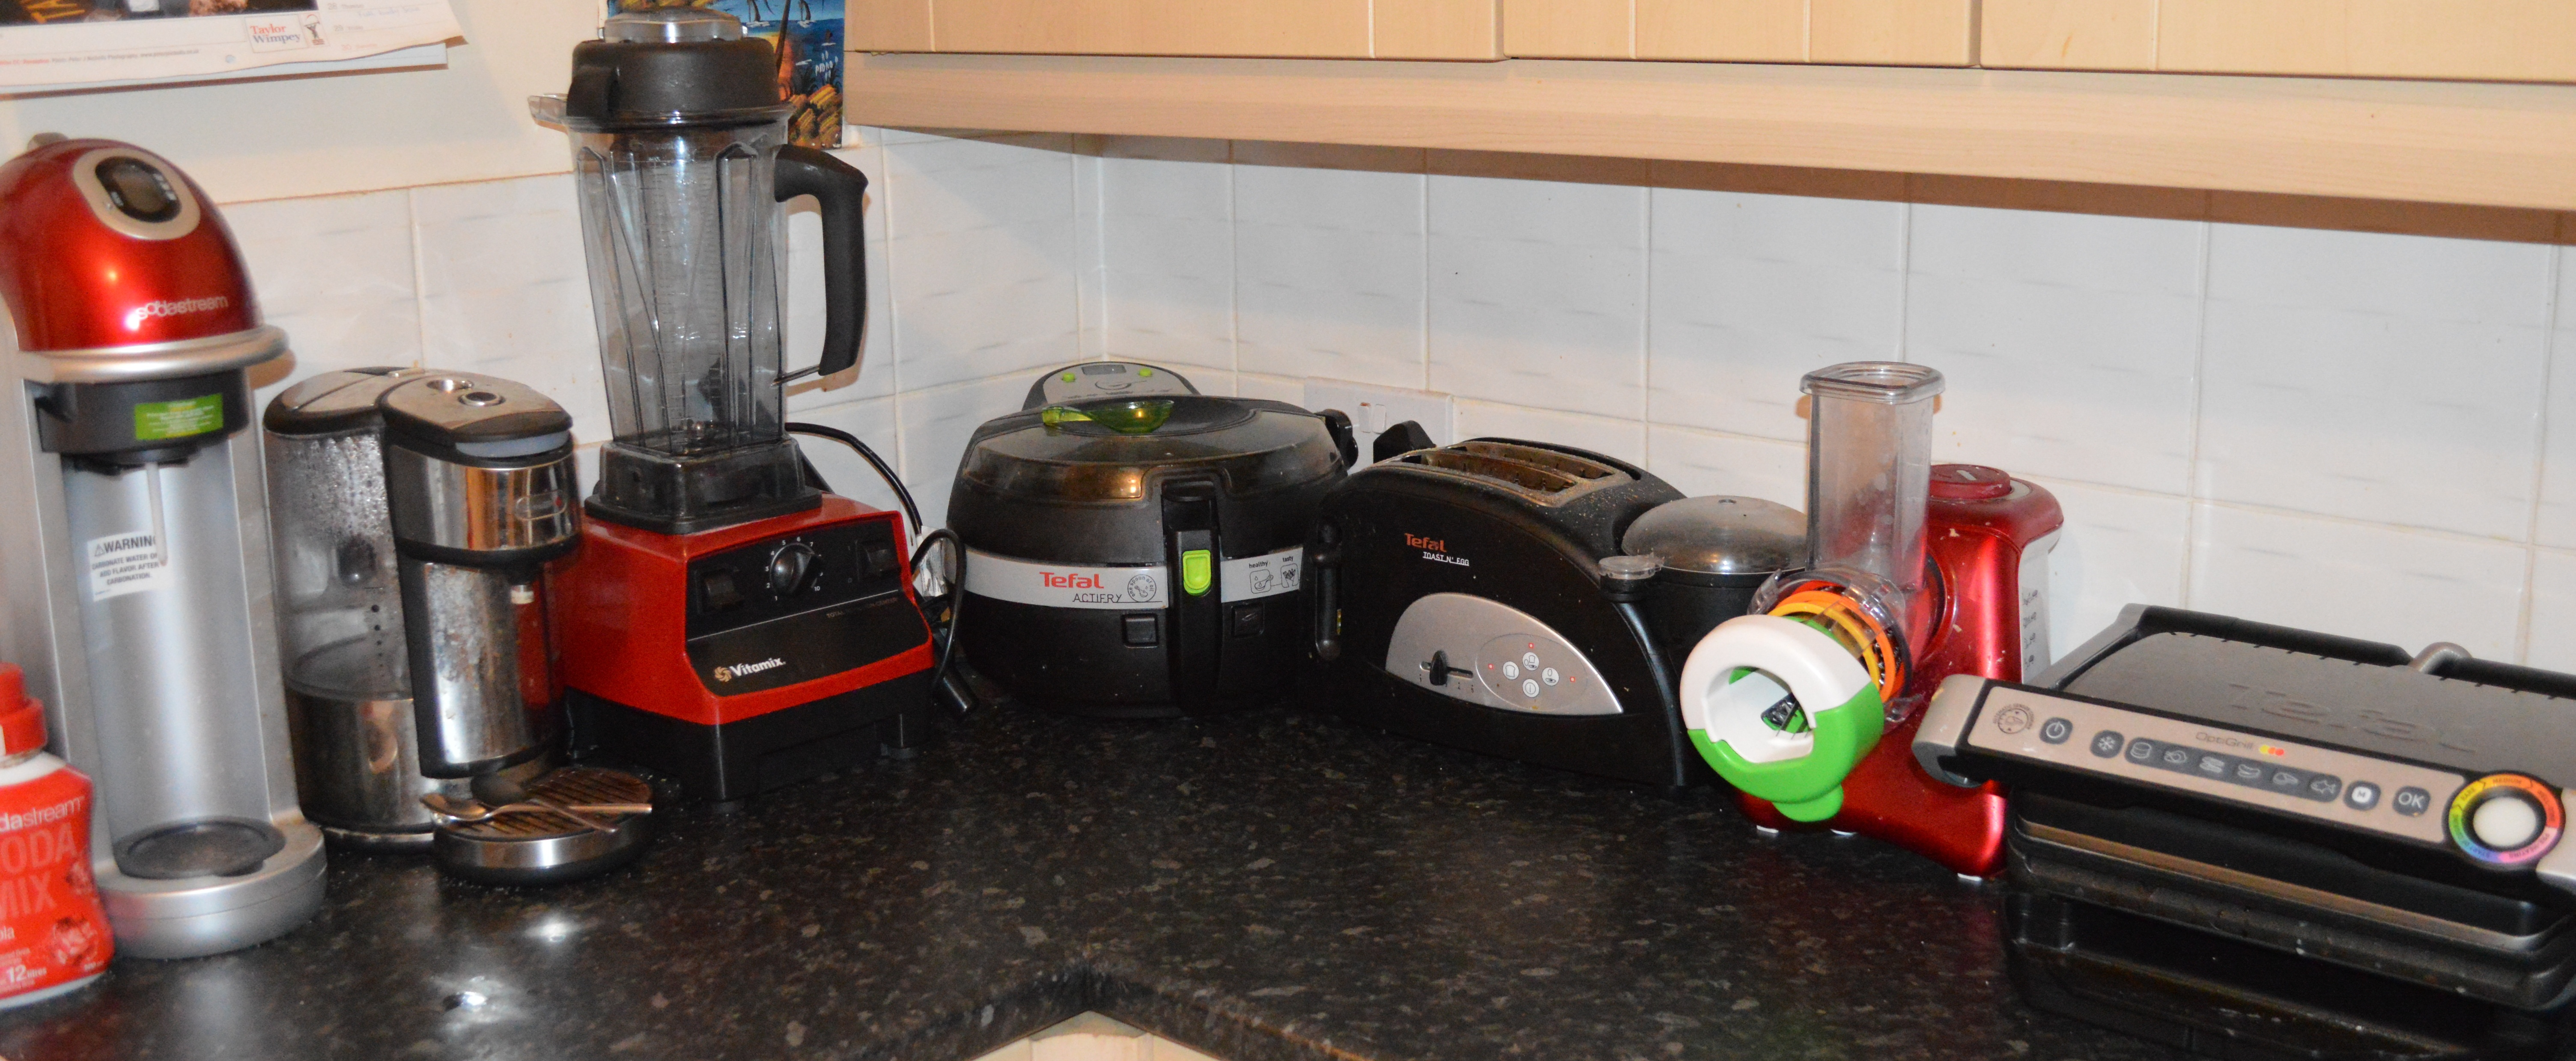 appliance addict